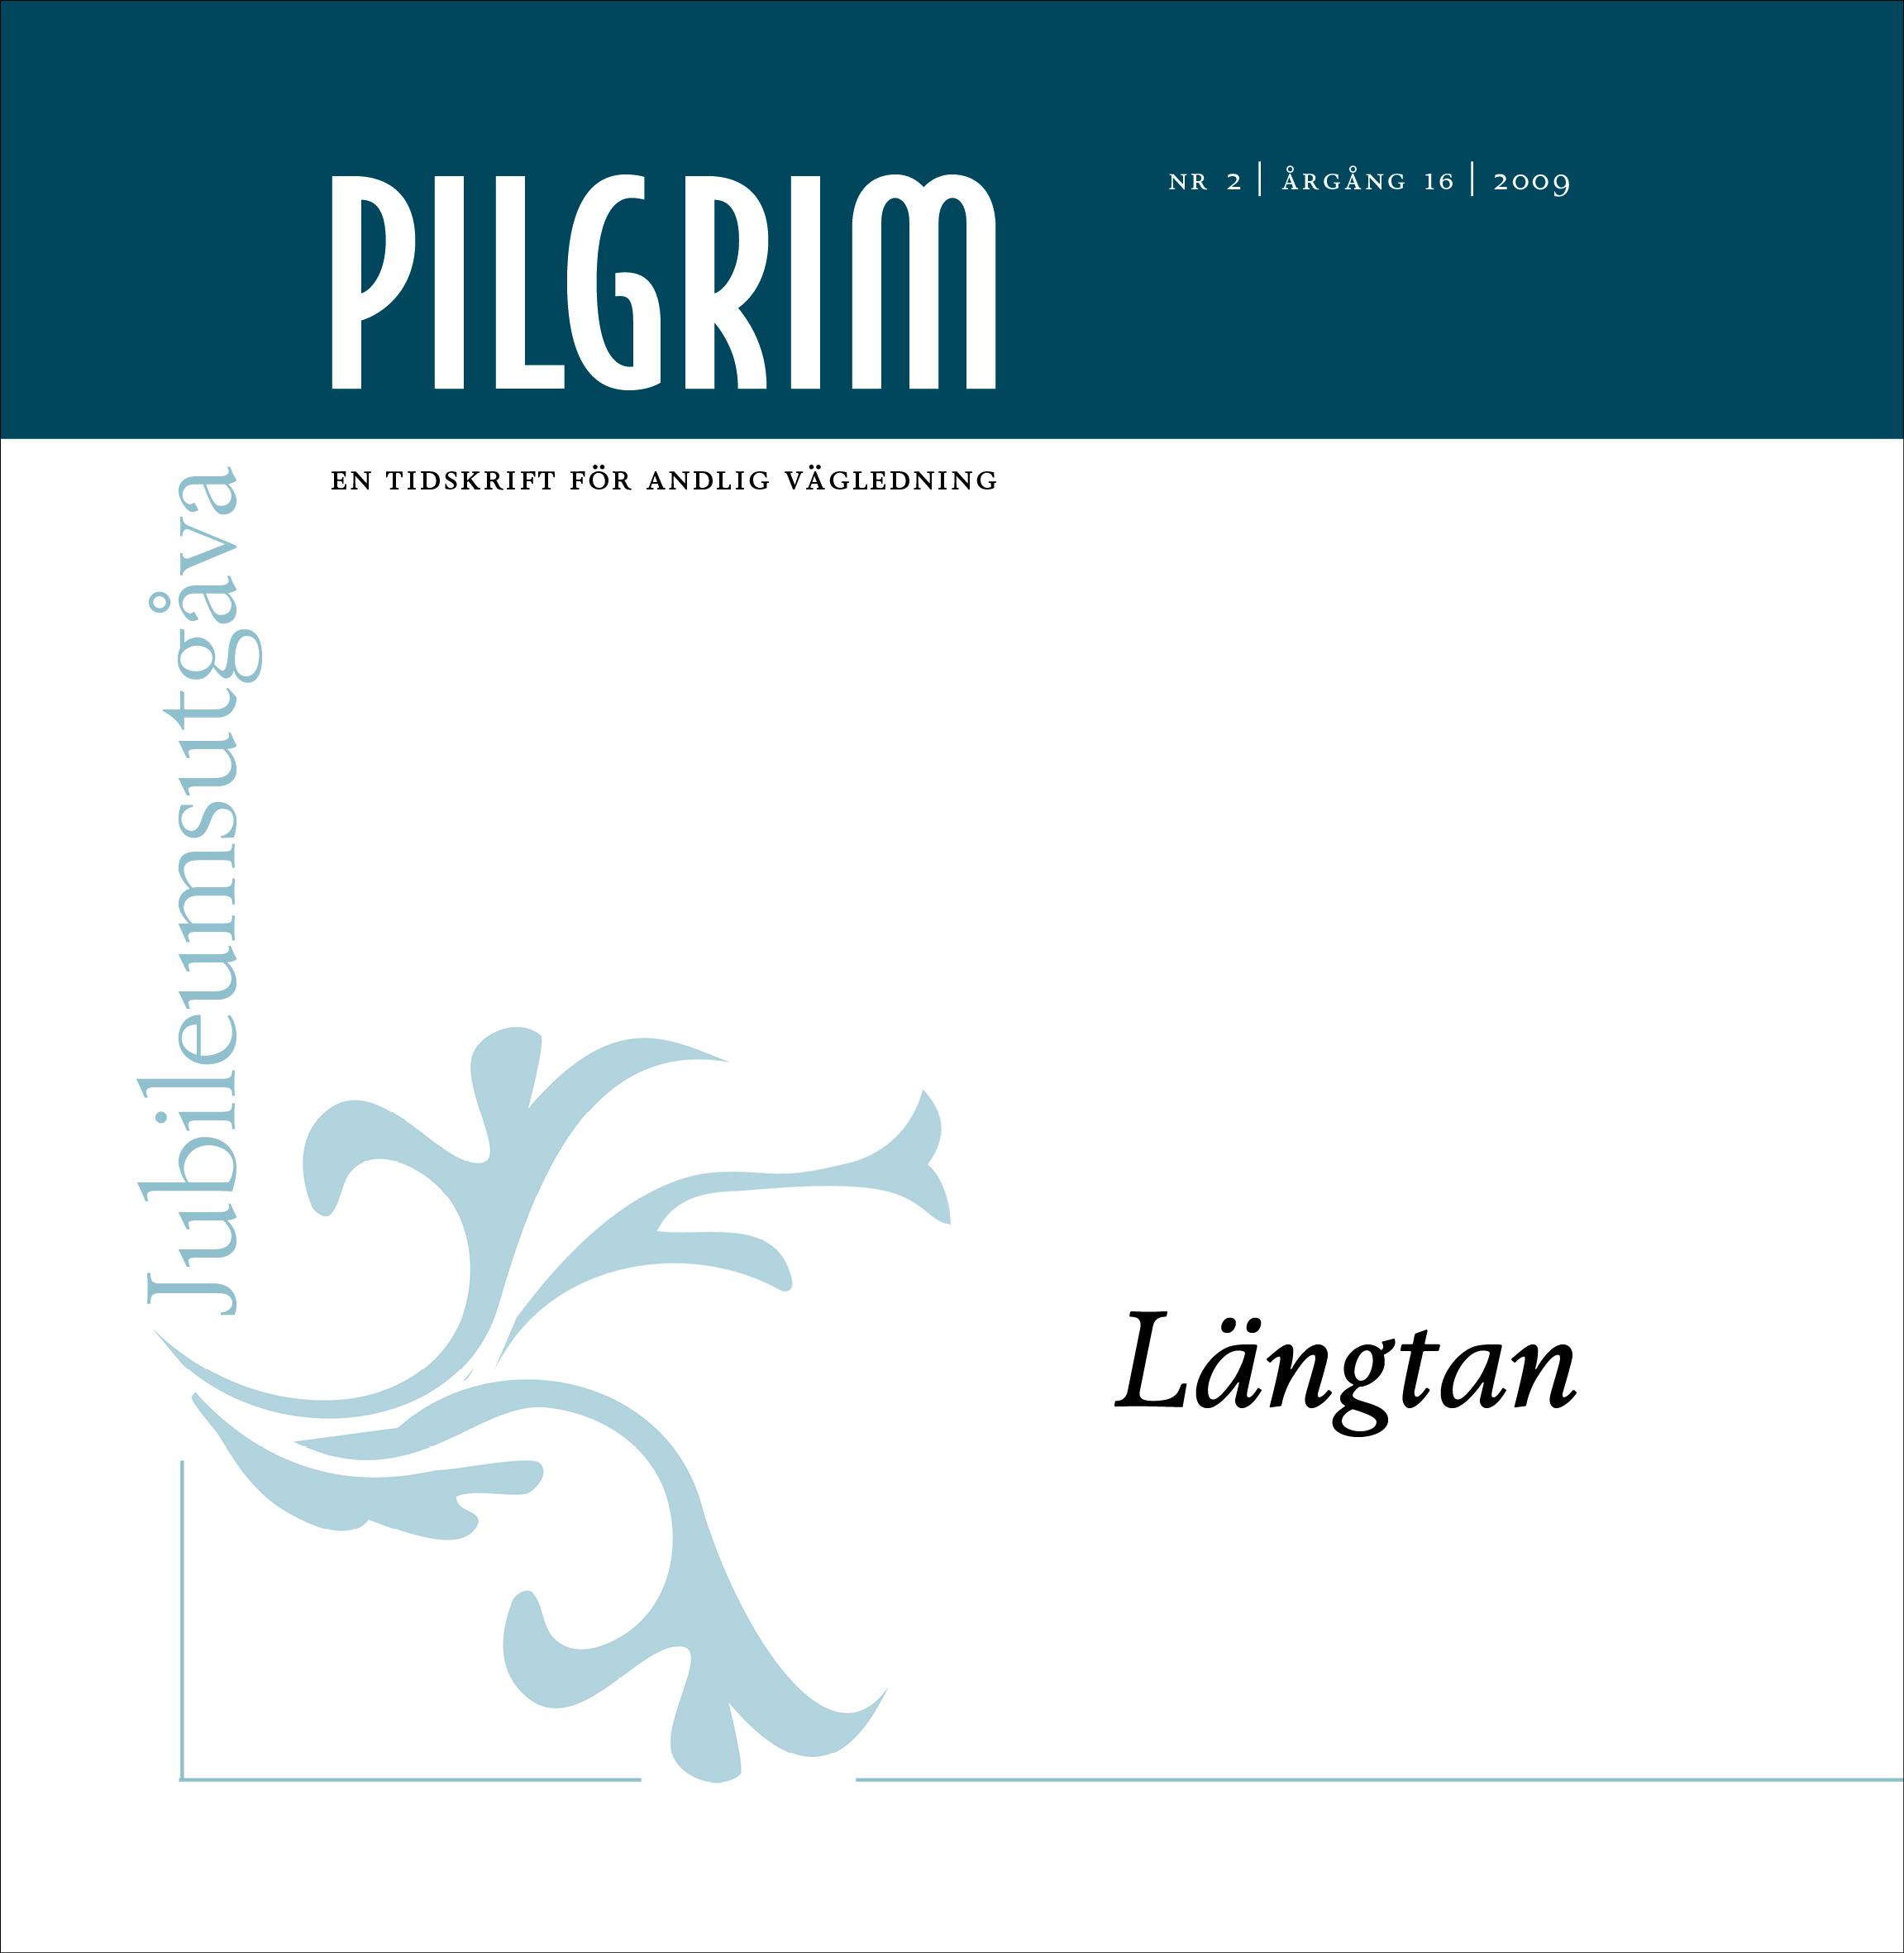 Pilgrim frams 2009-2